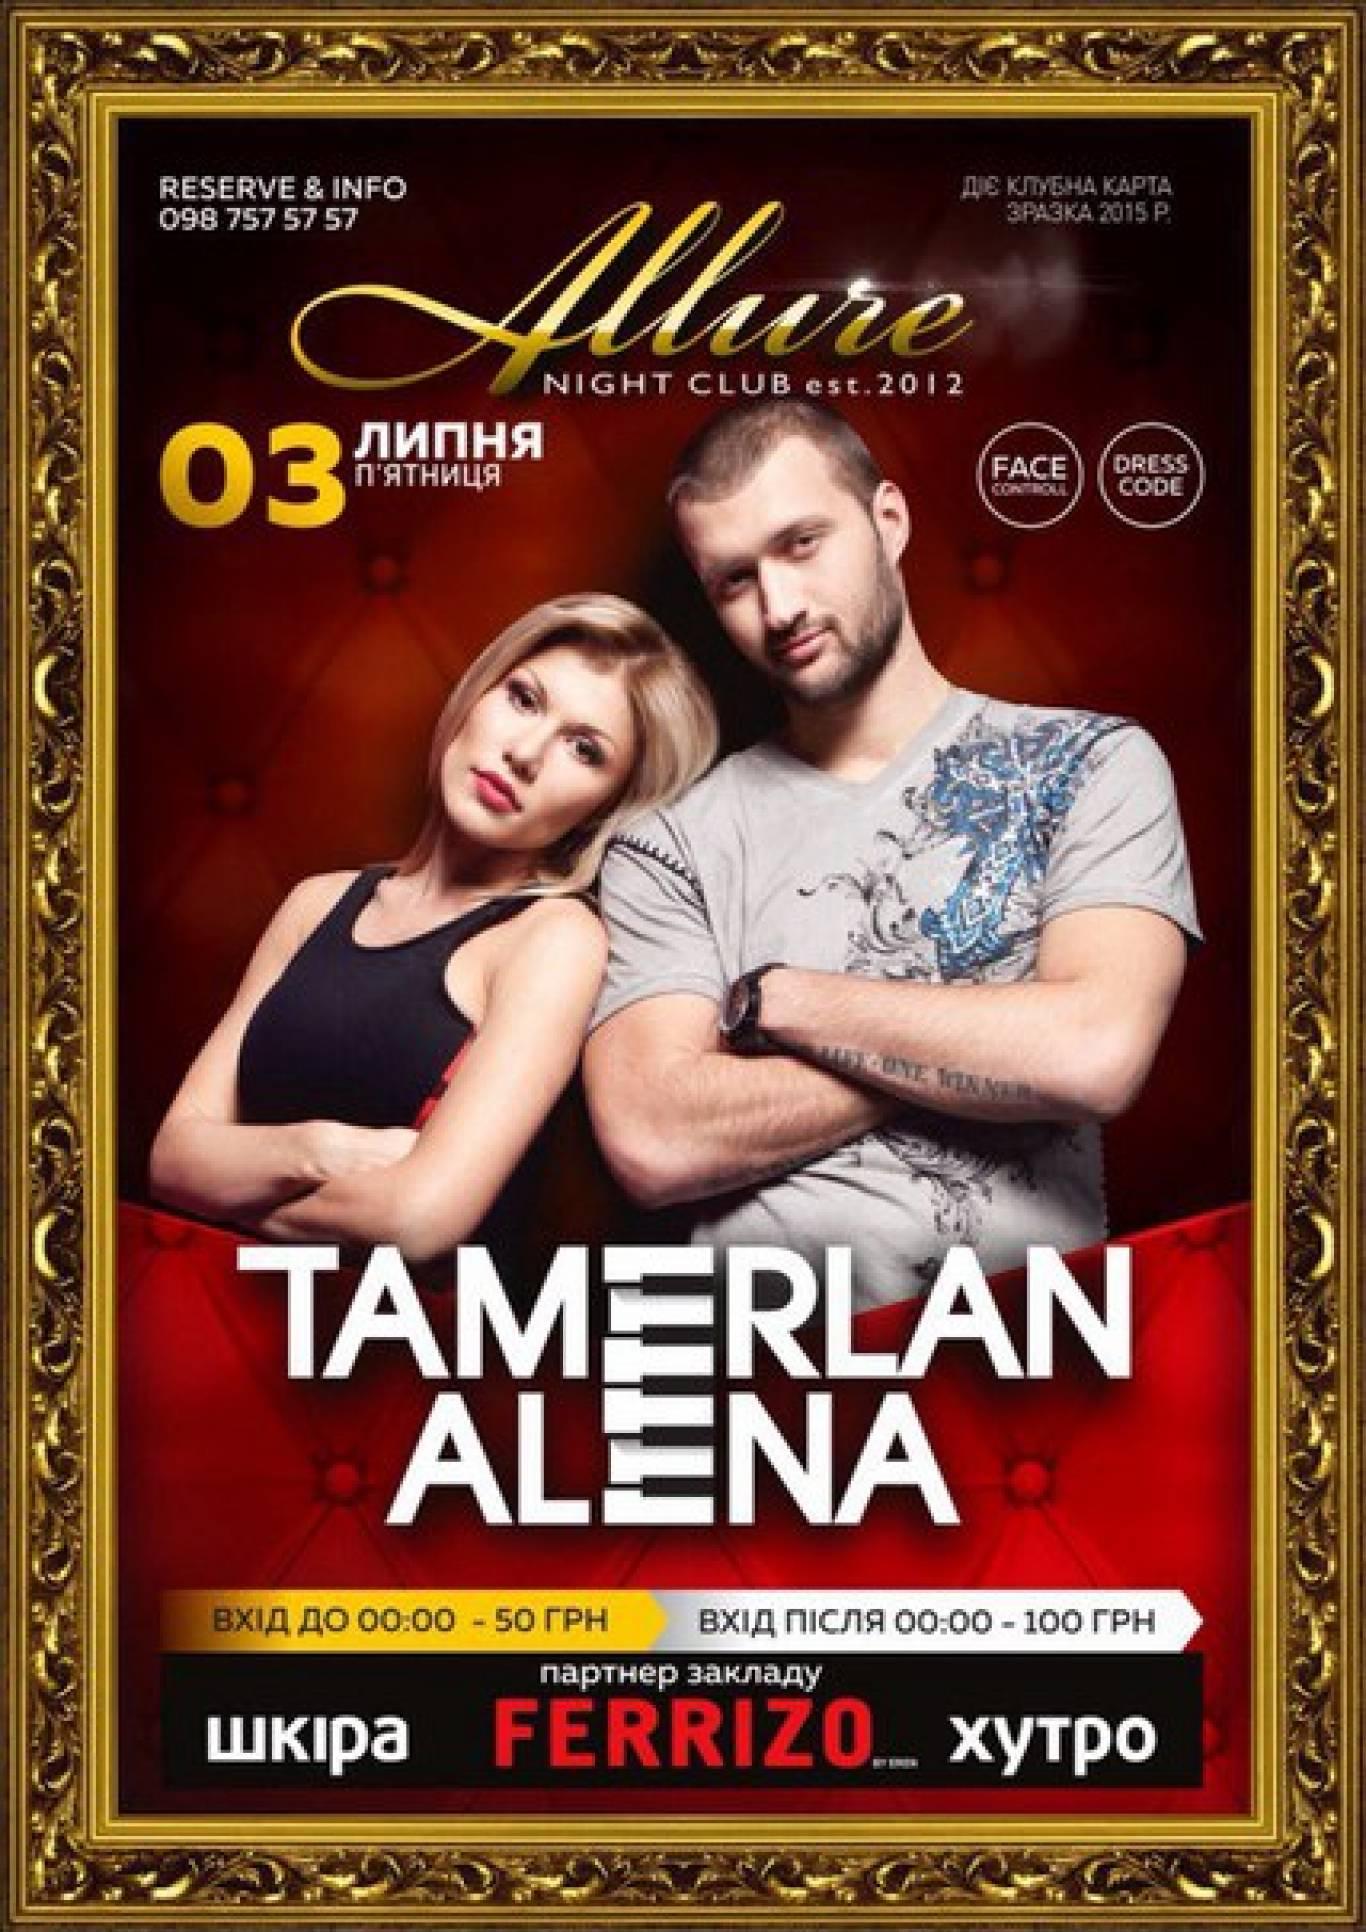 Tamerlan&Alena